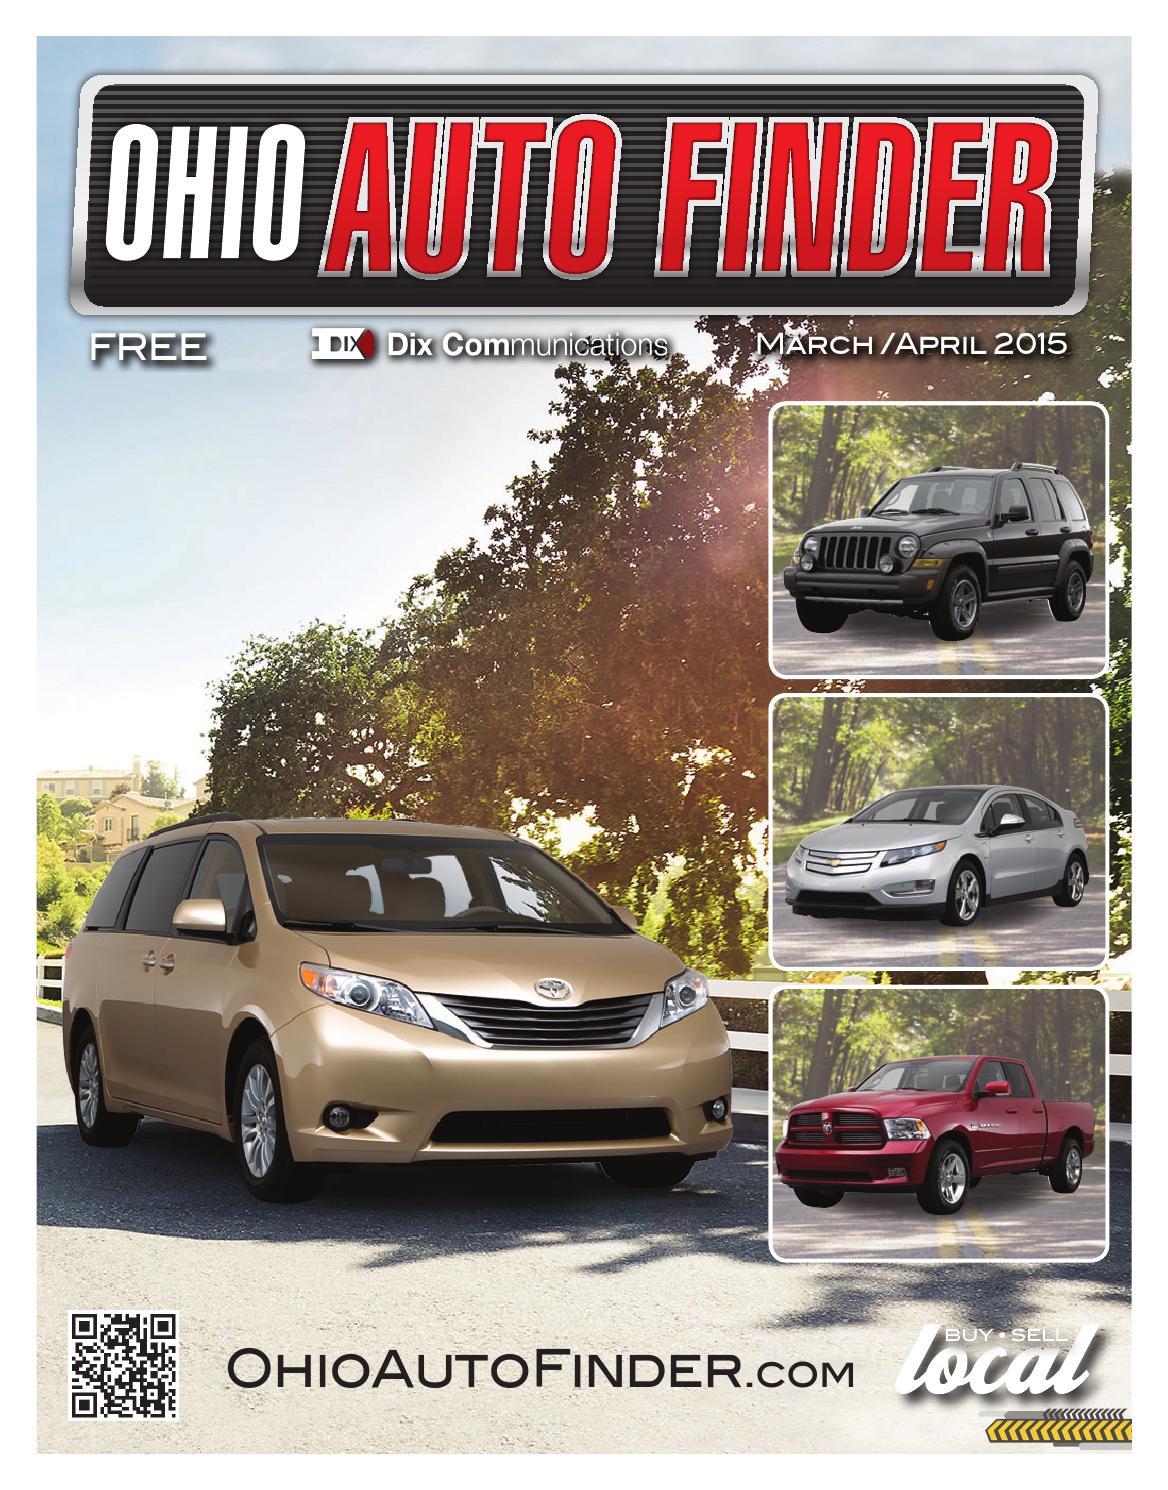 Ohio Auto Finder - Mar/Apr 2015 by GateHouse Media NEO - issuu